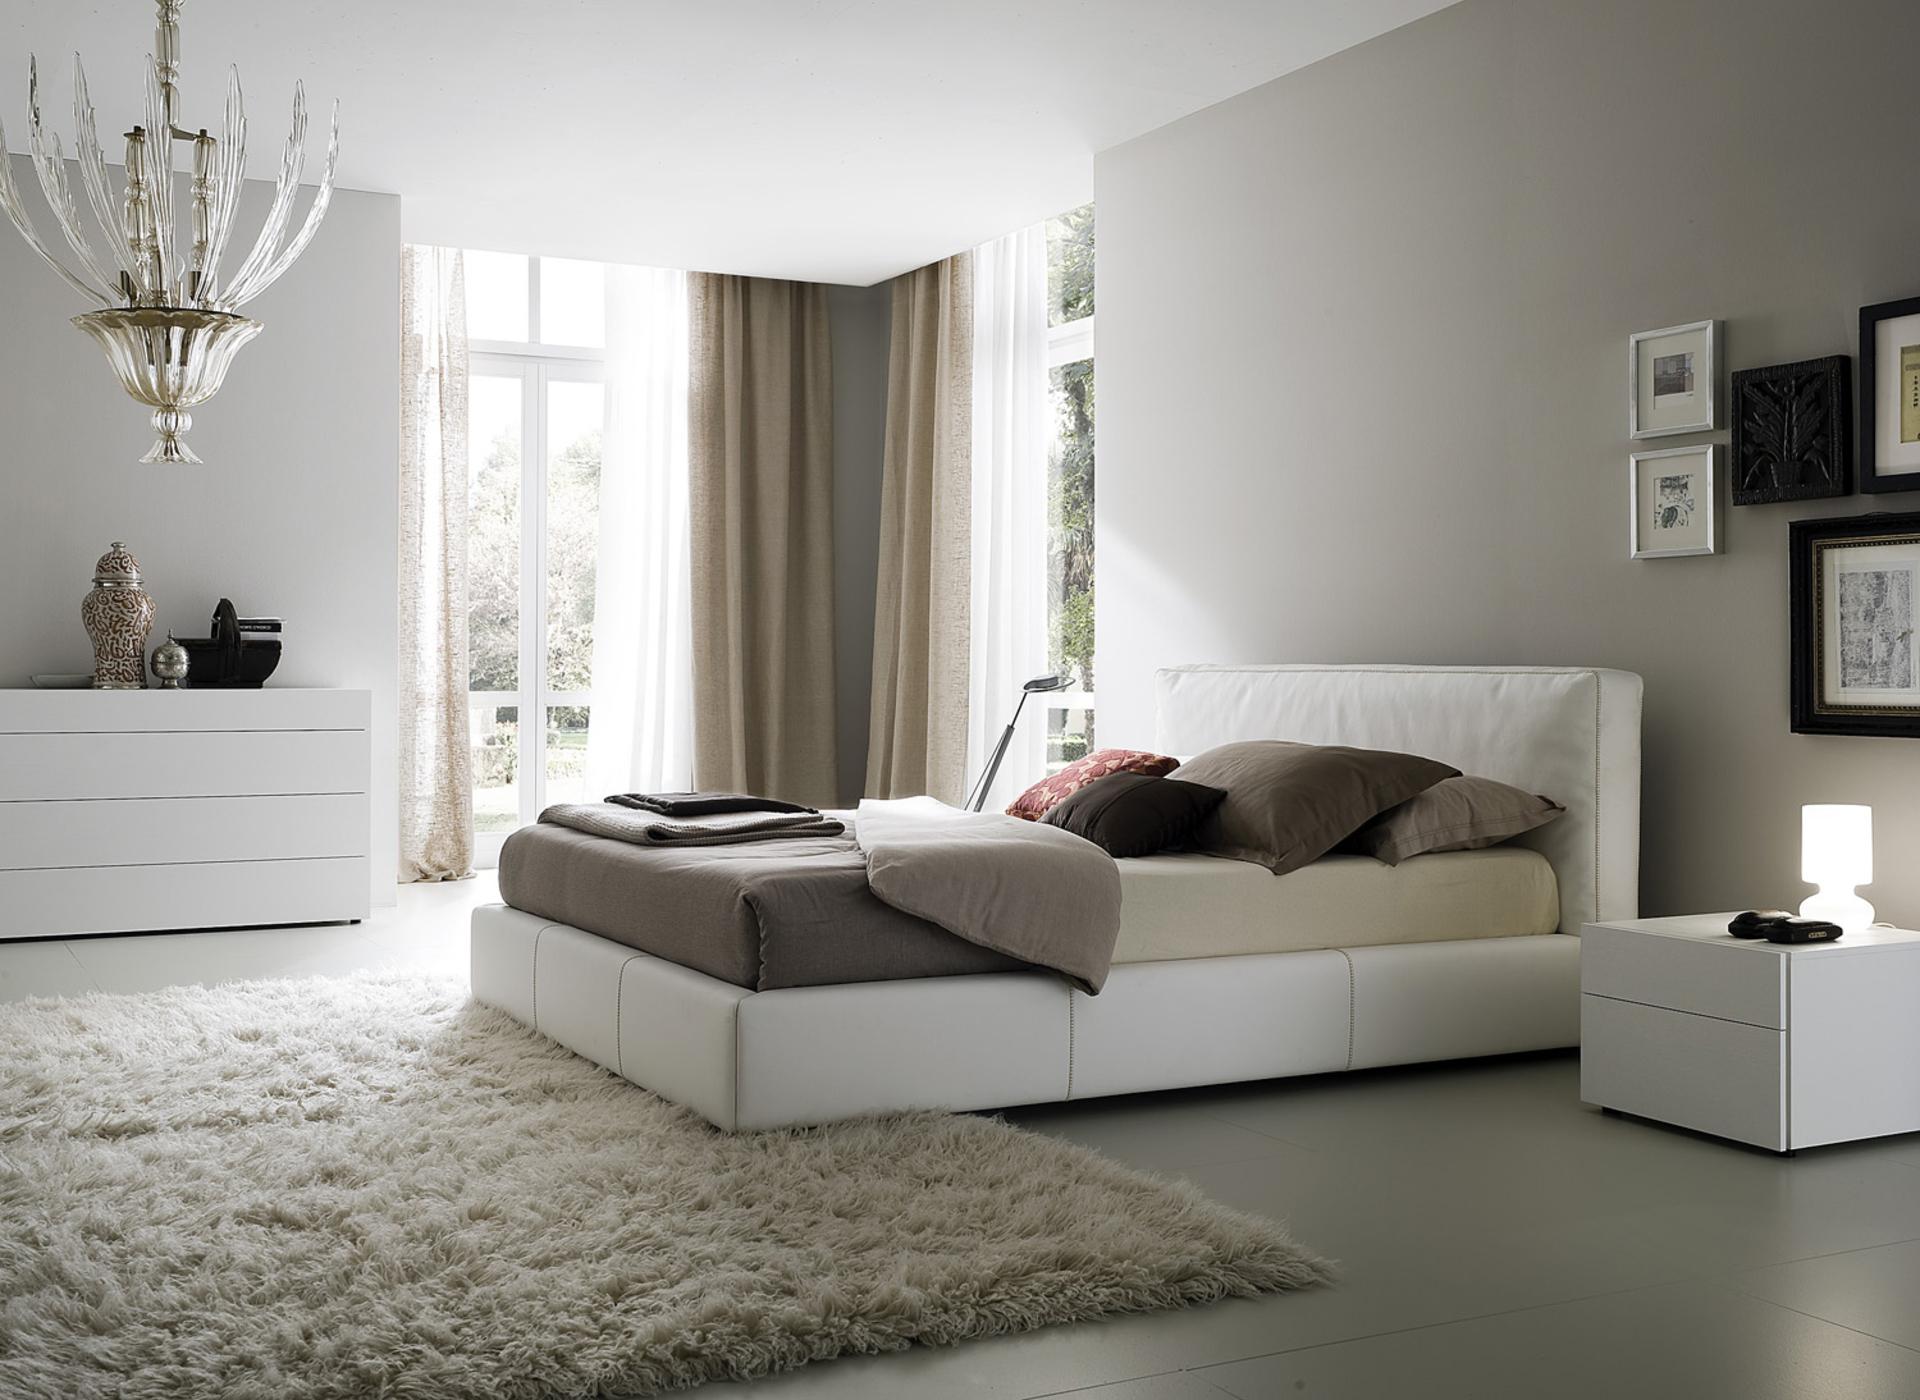 minimalist-home-interior-design-bedroom-in-modern-on-bold-design-dream-house.jpg